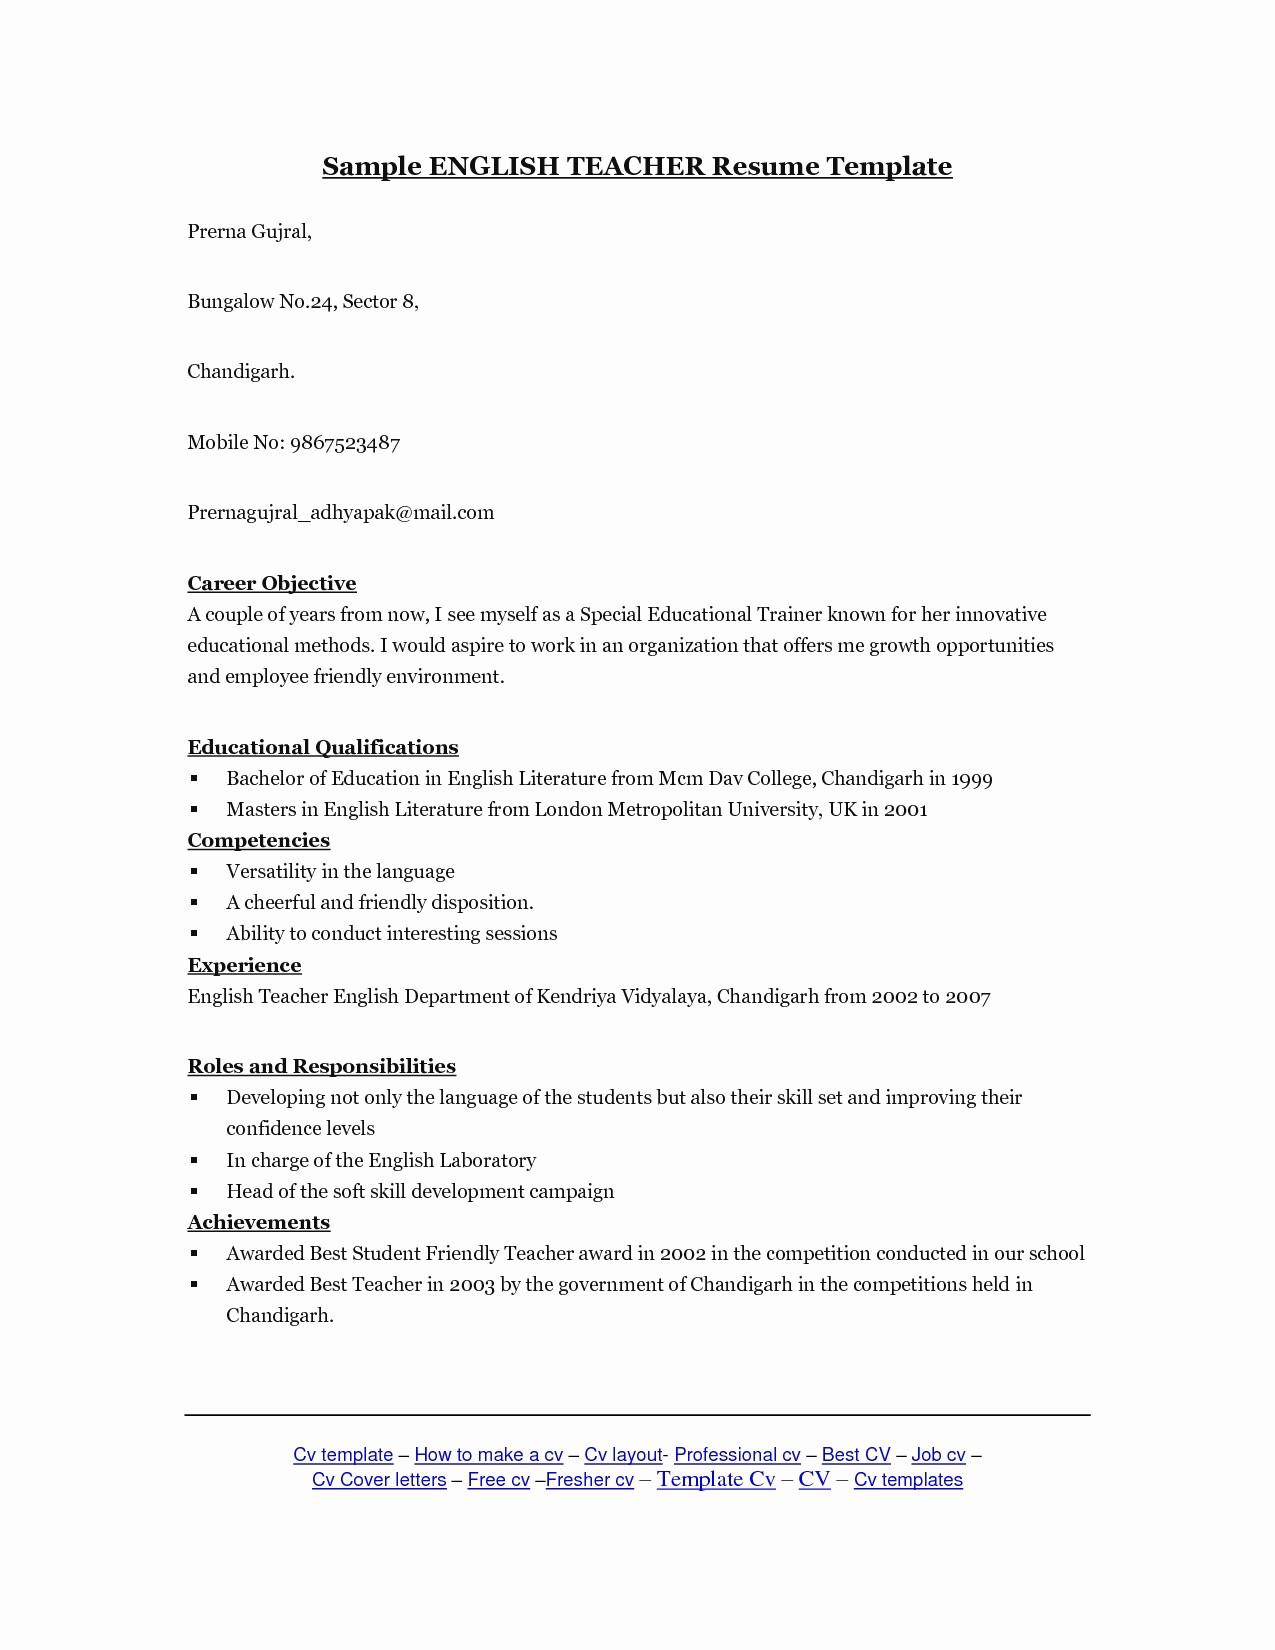 Free Resume Templates In English New Teacher Resume 9 Free Sample